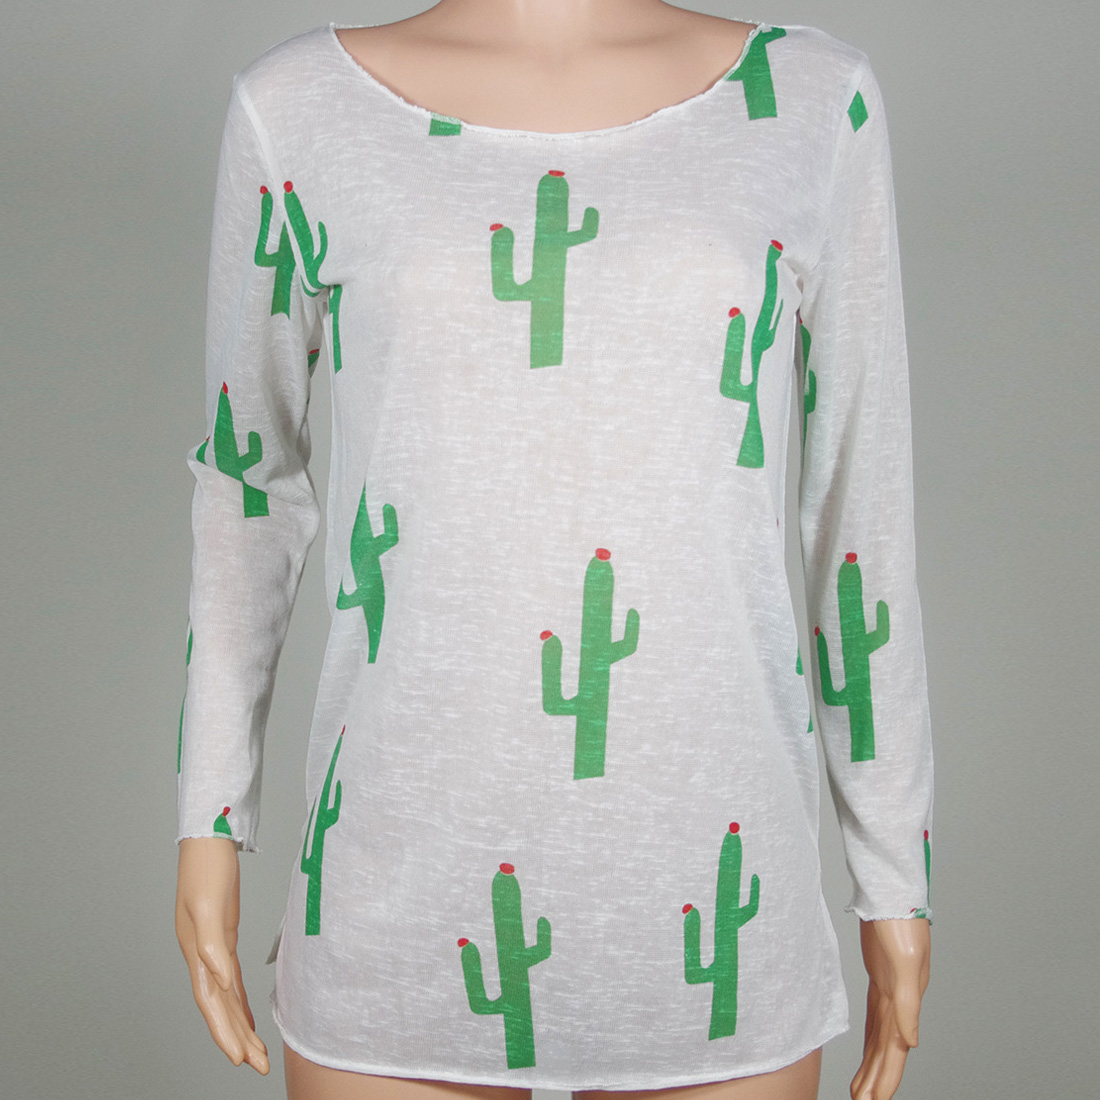 Putih Kaos Wanita Panjang Lengan Rajutan Blusas Gadis Kaktus Sweater Produk Foto